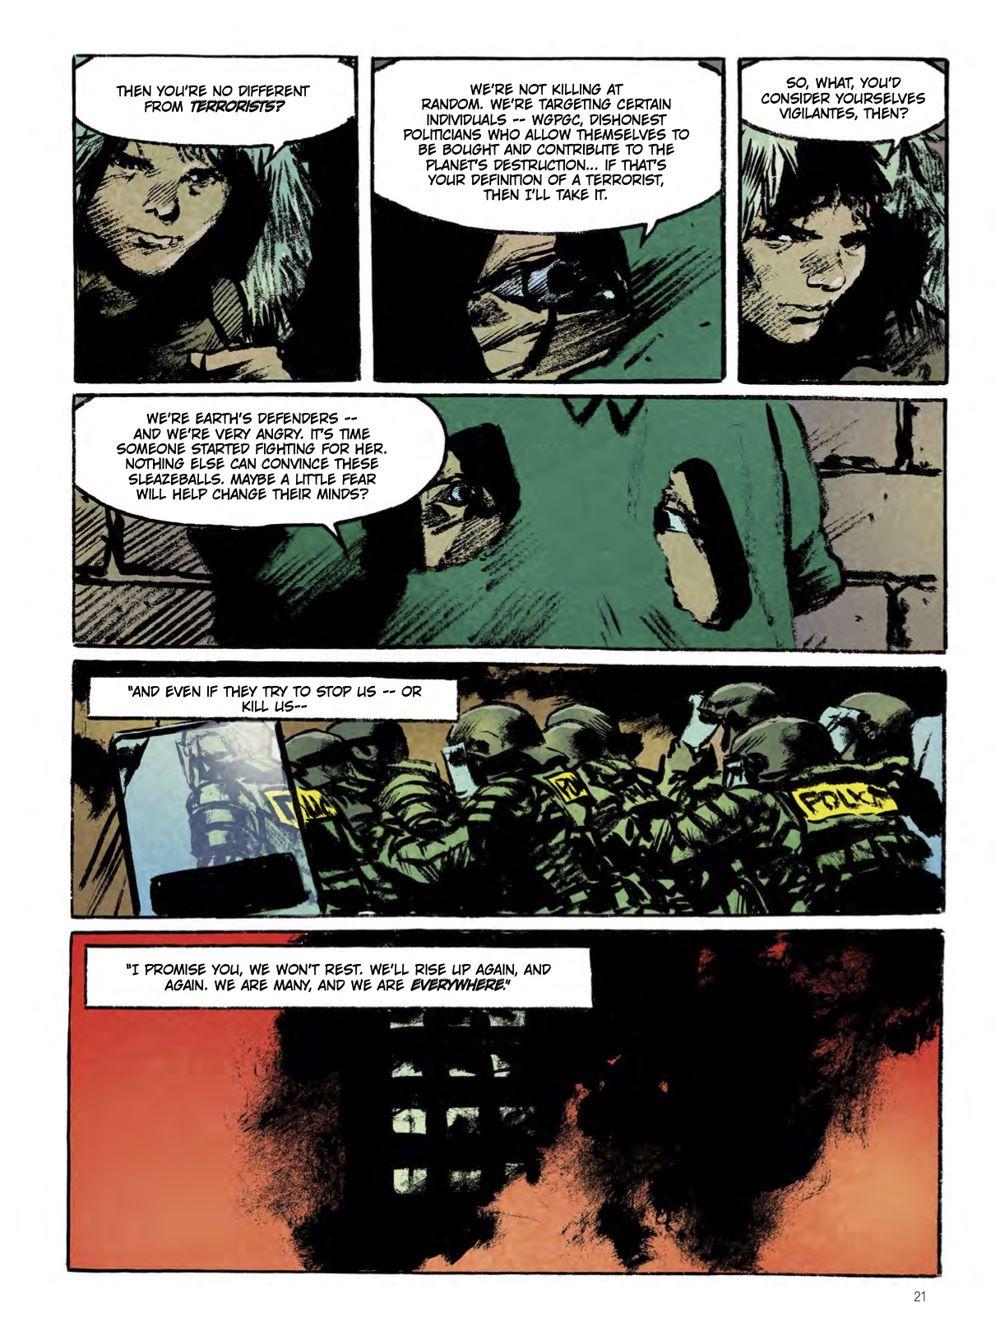 snowpiercer_the_prequel-extinction-2 ComicList Previews: SNOWPIERCER PREQUEL VOLUME 1 EXTINCTION GN